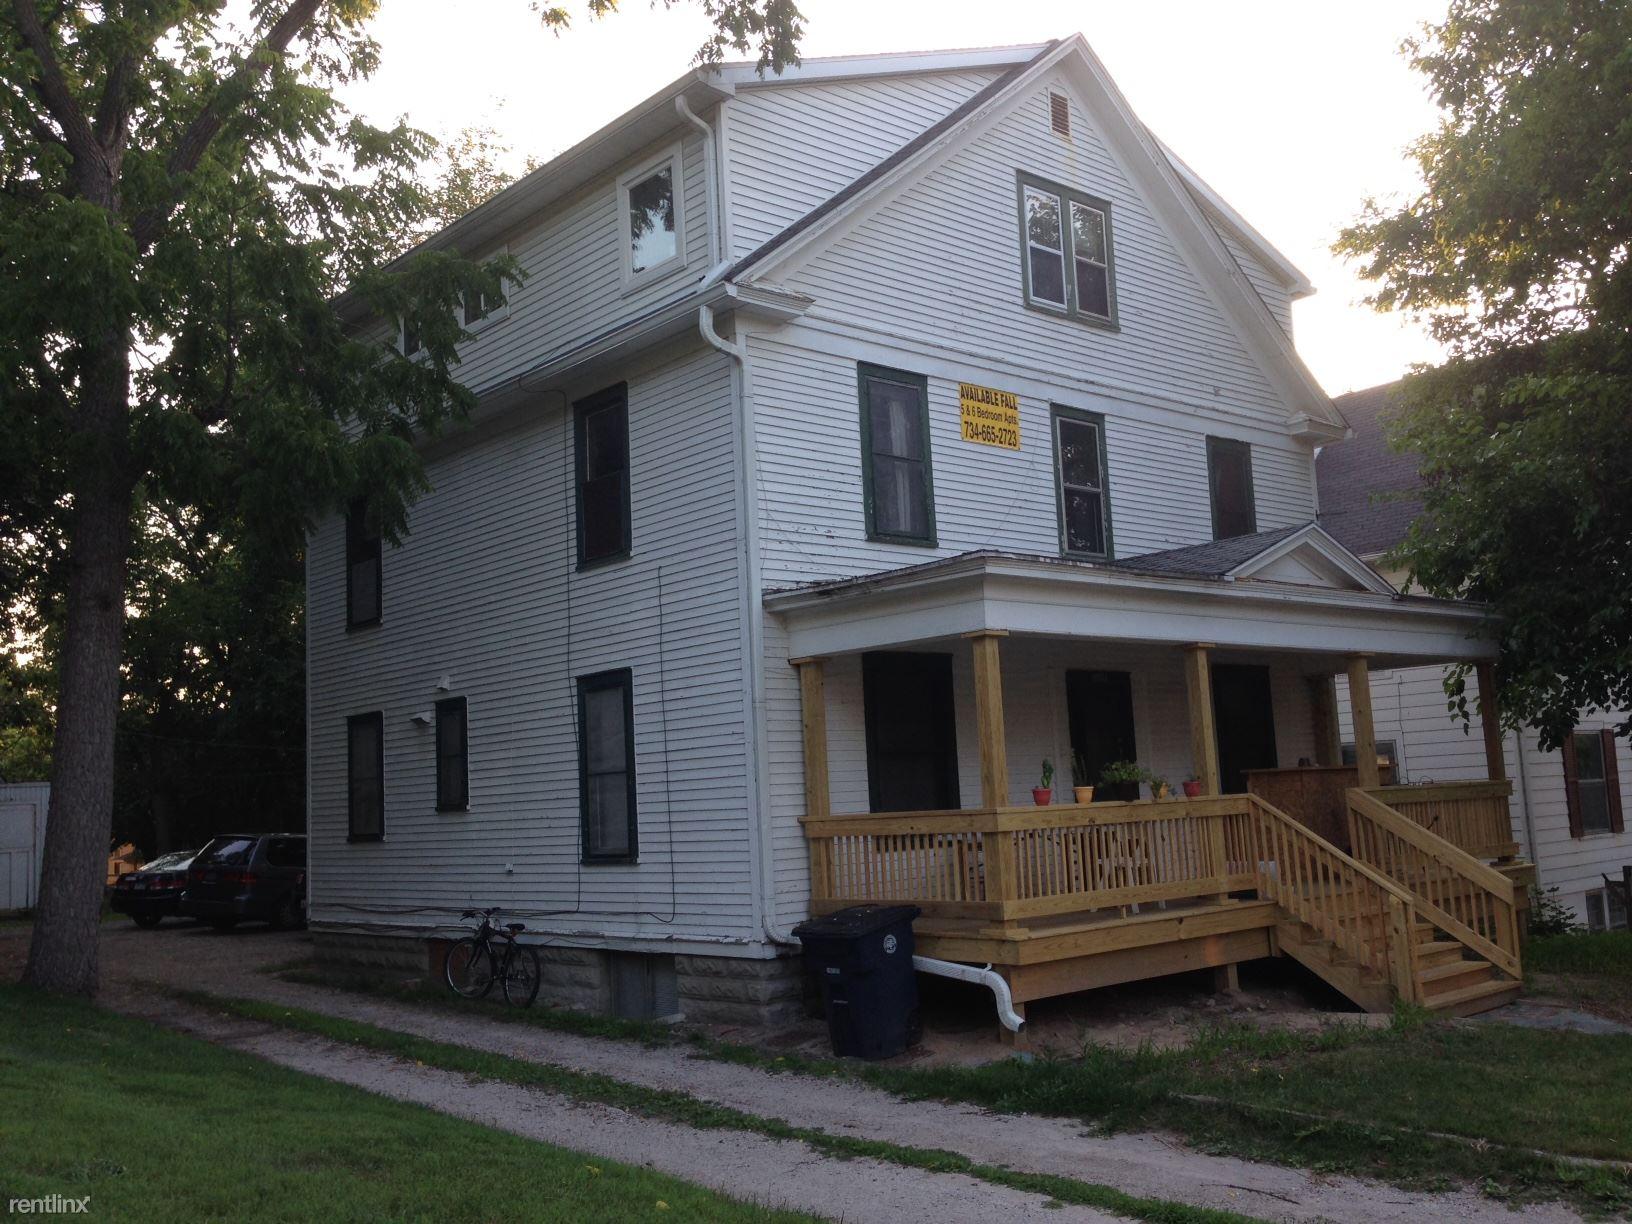 1114 Prospect St Apt 2, Ann Arbor, MI - $4,500